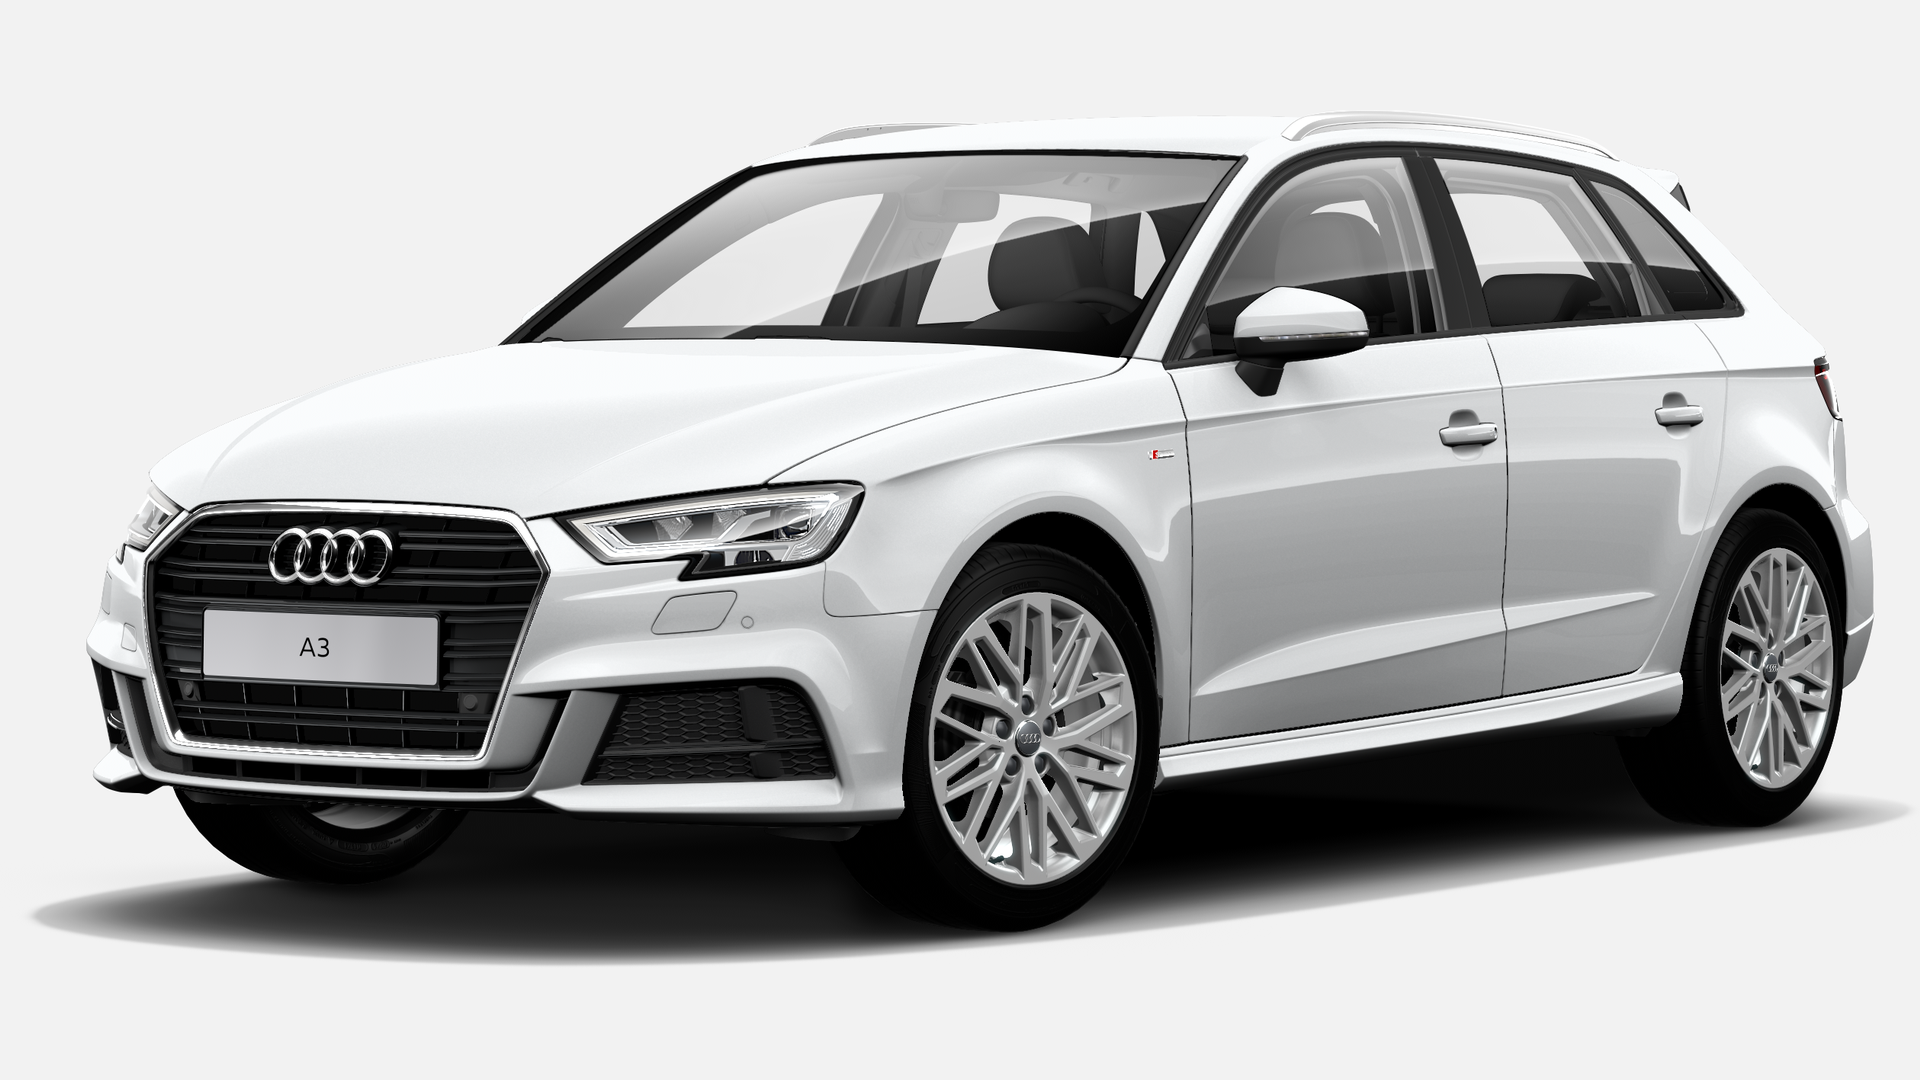 Audi A3 Sportback 30 TDI S line 85 kW (116 CV)  nuevo en Álava